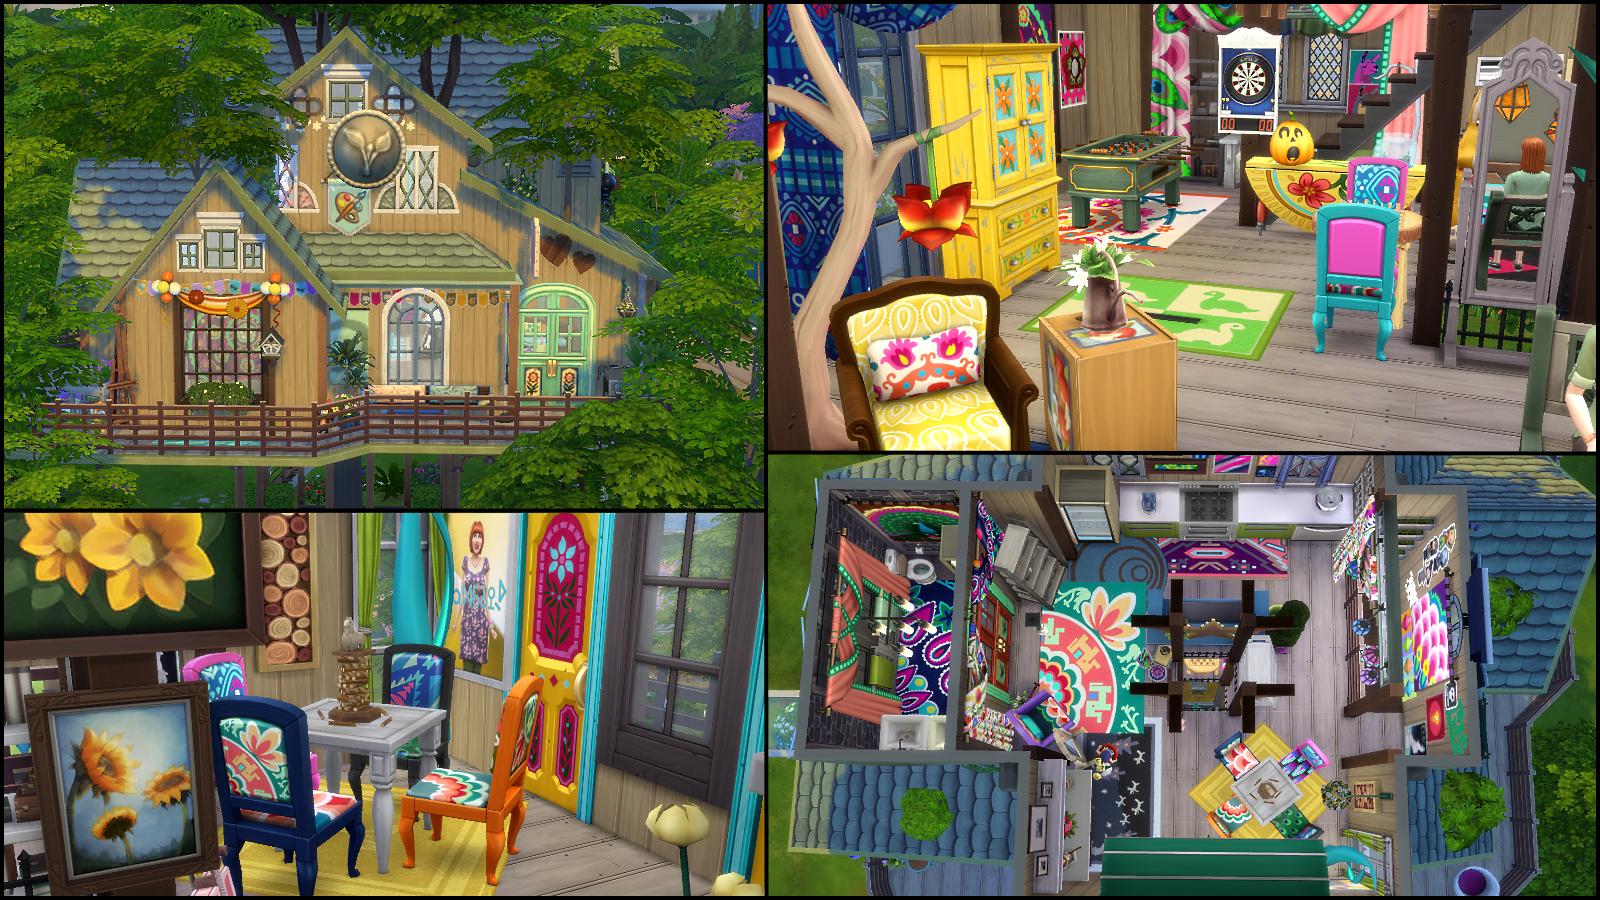 Urban treehouse sims 4 houses - Boho Treehouse Hangout By Qtchin 102 979